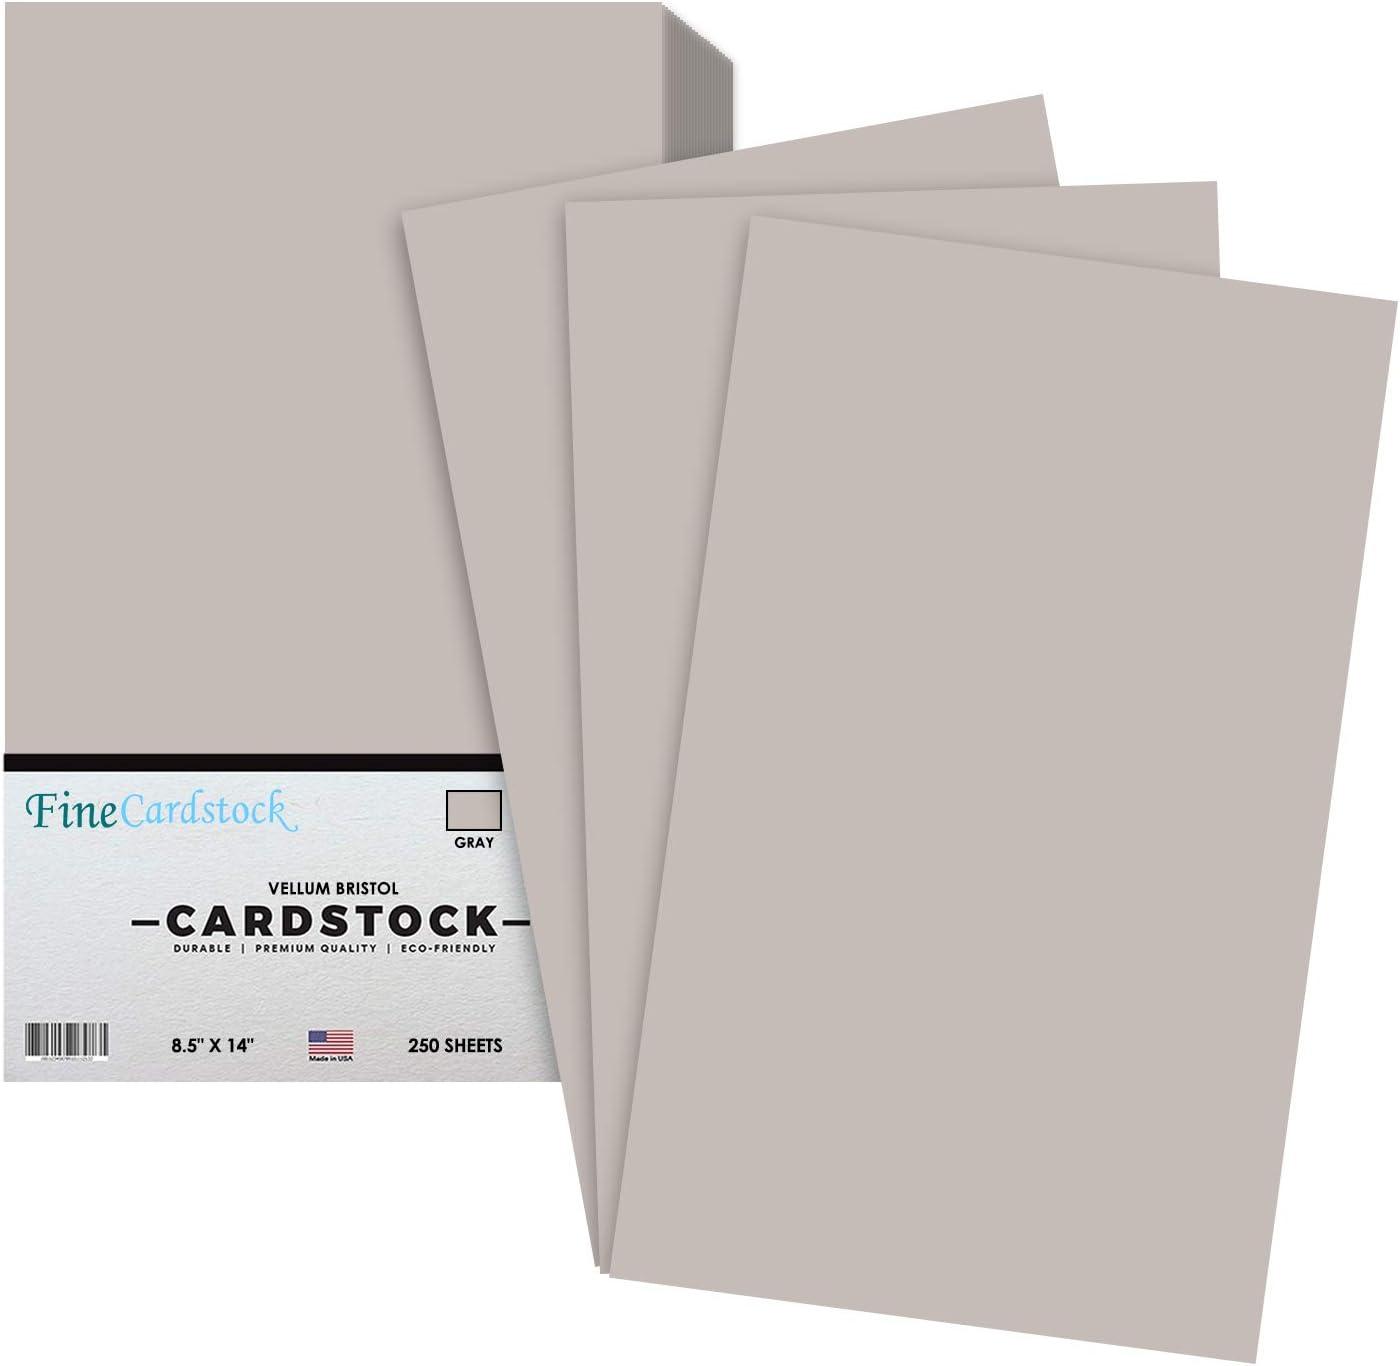 Pastel Blue Menu Legal Size 8.5 x 14 Inches 67 Vellum Bristol Lightweight Card Stock Paper Cover 1 Ream of 250 Sheets Per Pack